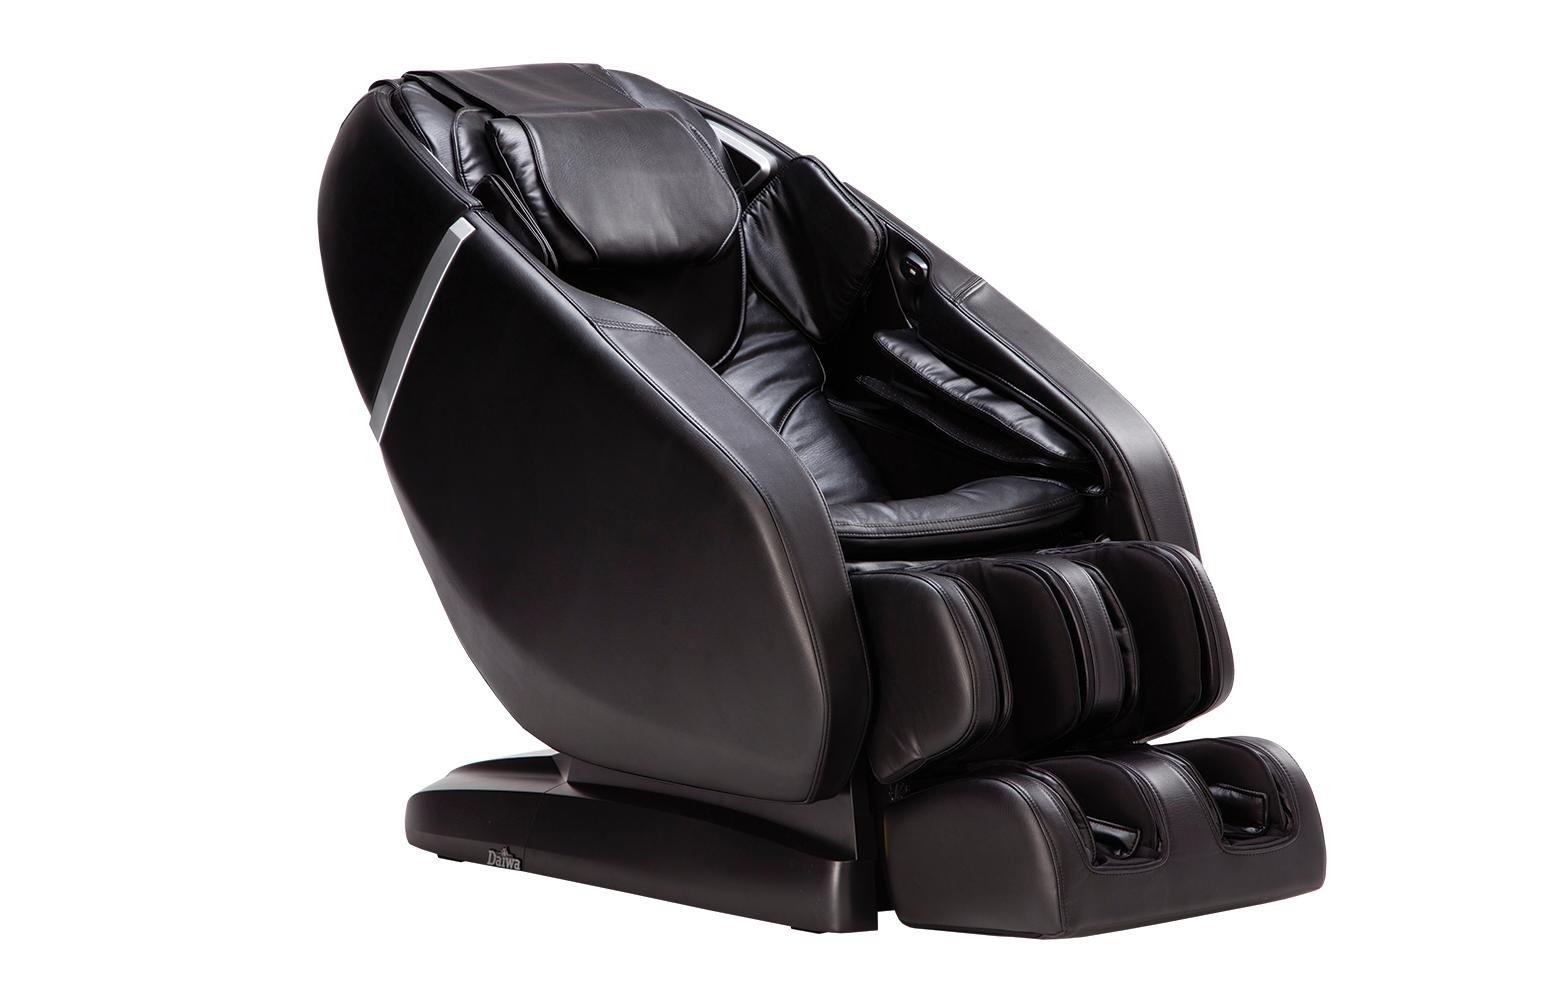 Black Majesty Massage Chair